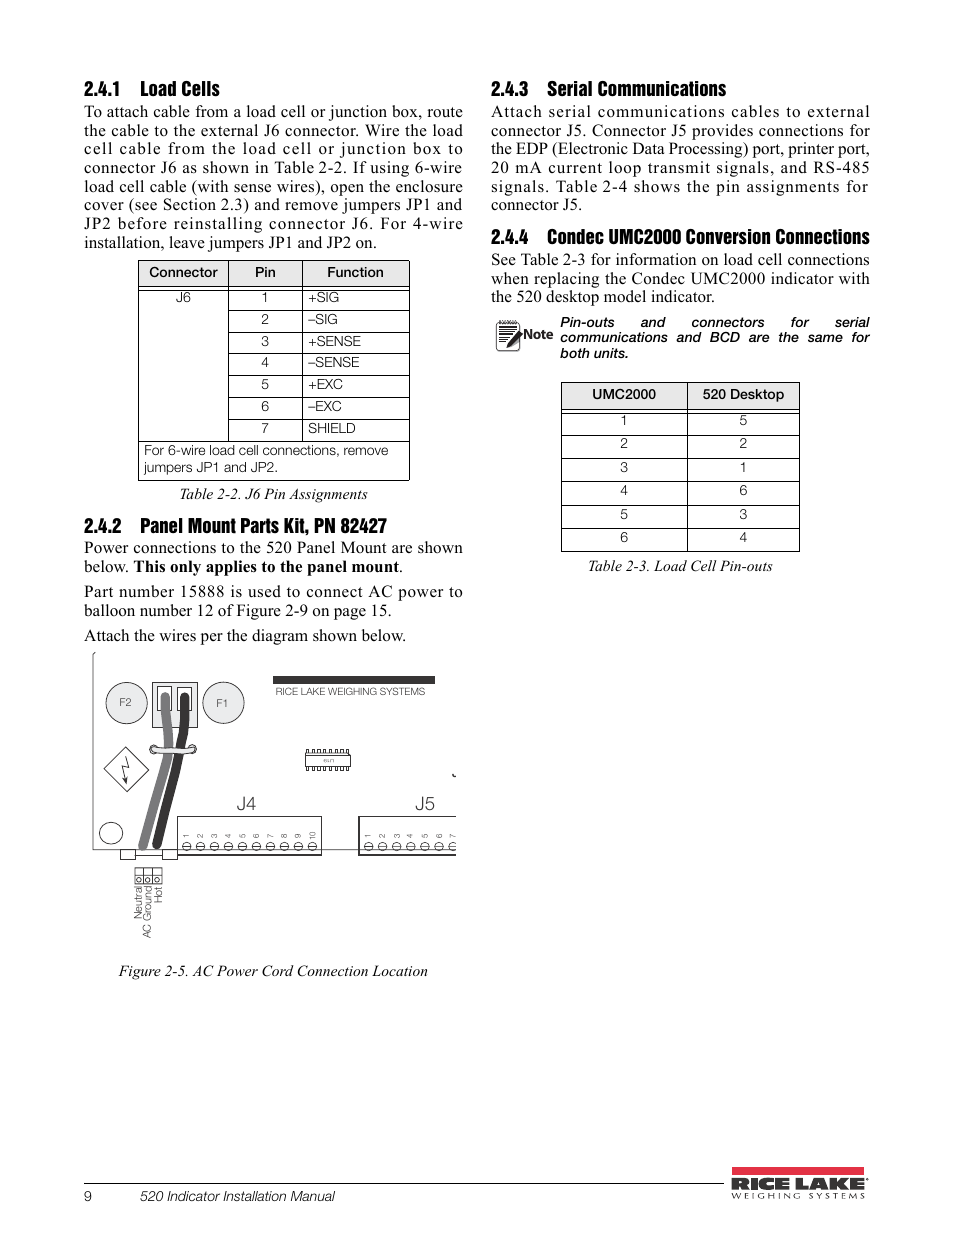 1 Load Cells 2 Panel Mount Parts Kit Pn 82427 3 Serial Hmi Wiring Diagram Communications